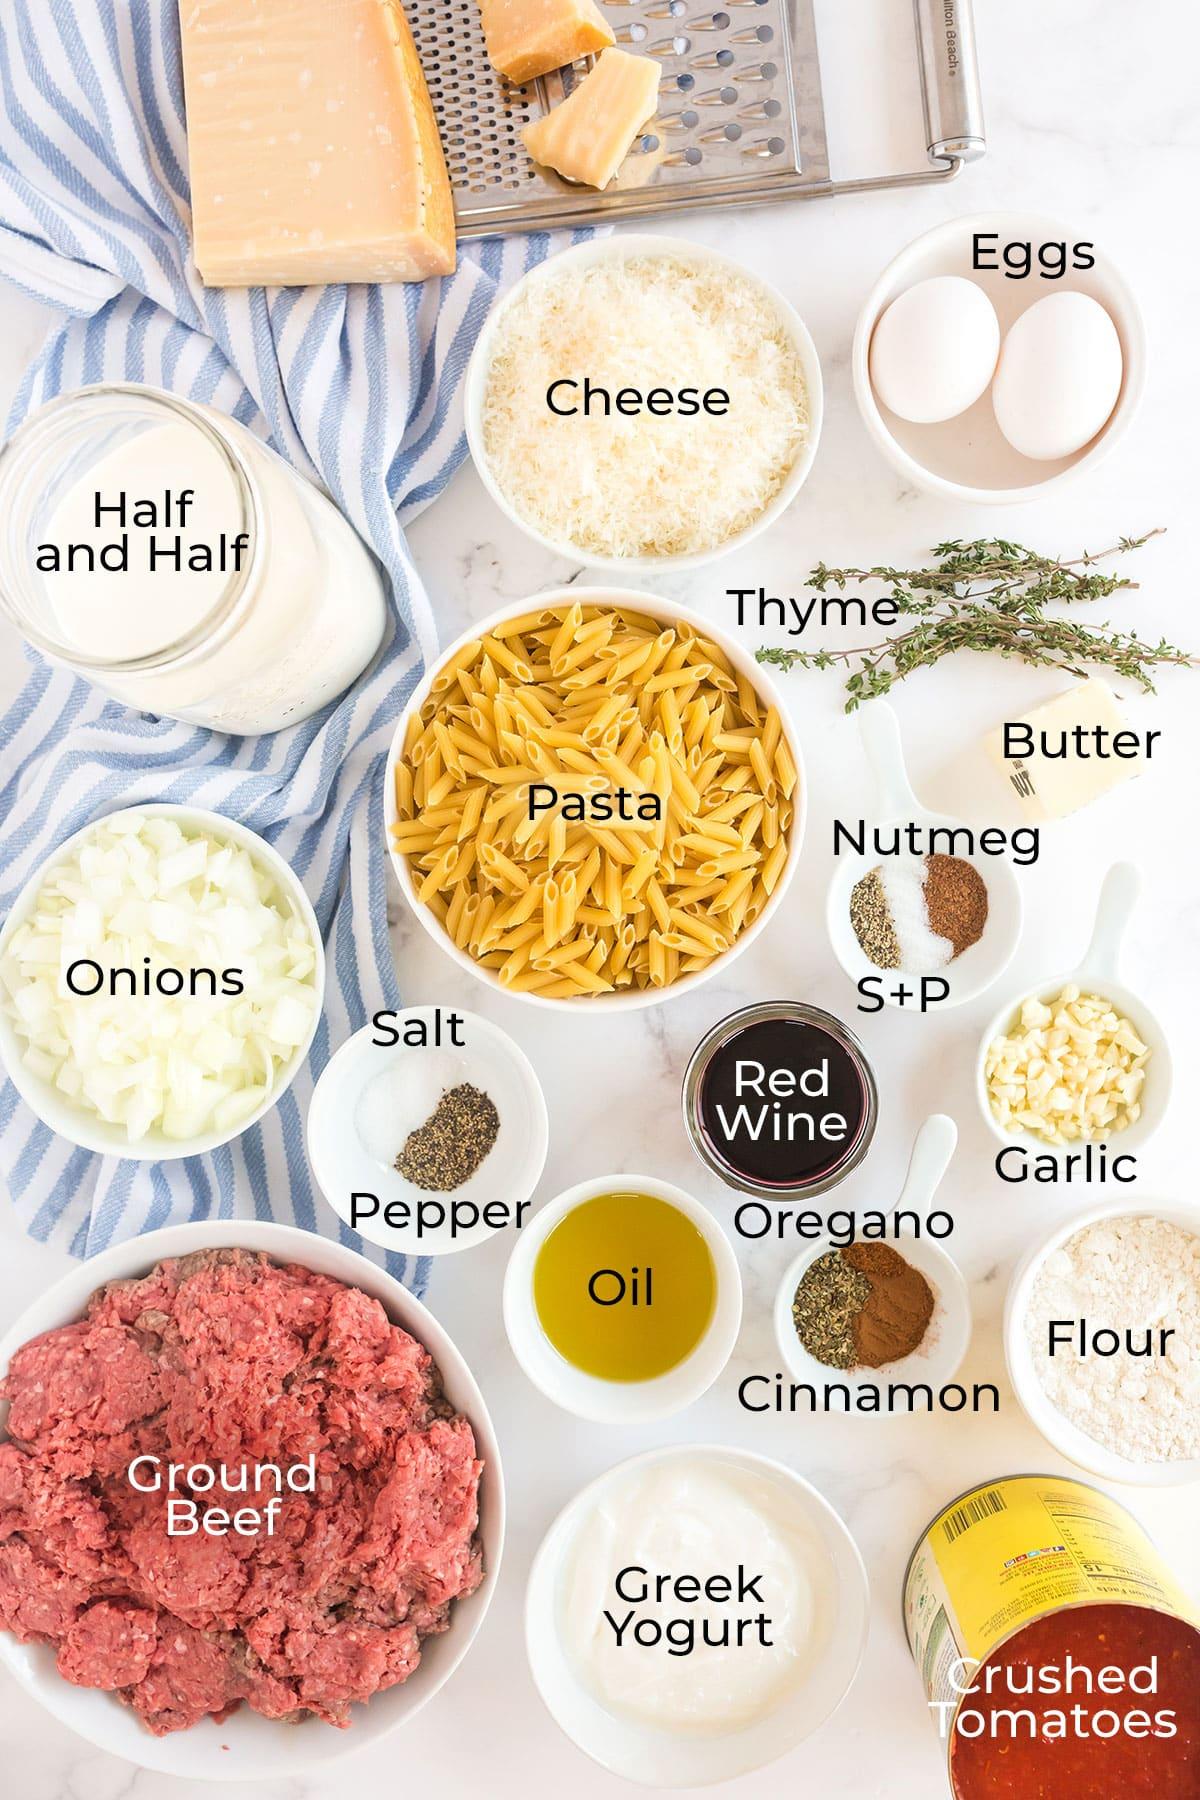 ingredients to make pastitsio pasta bake